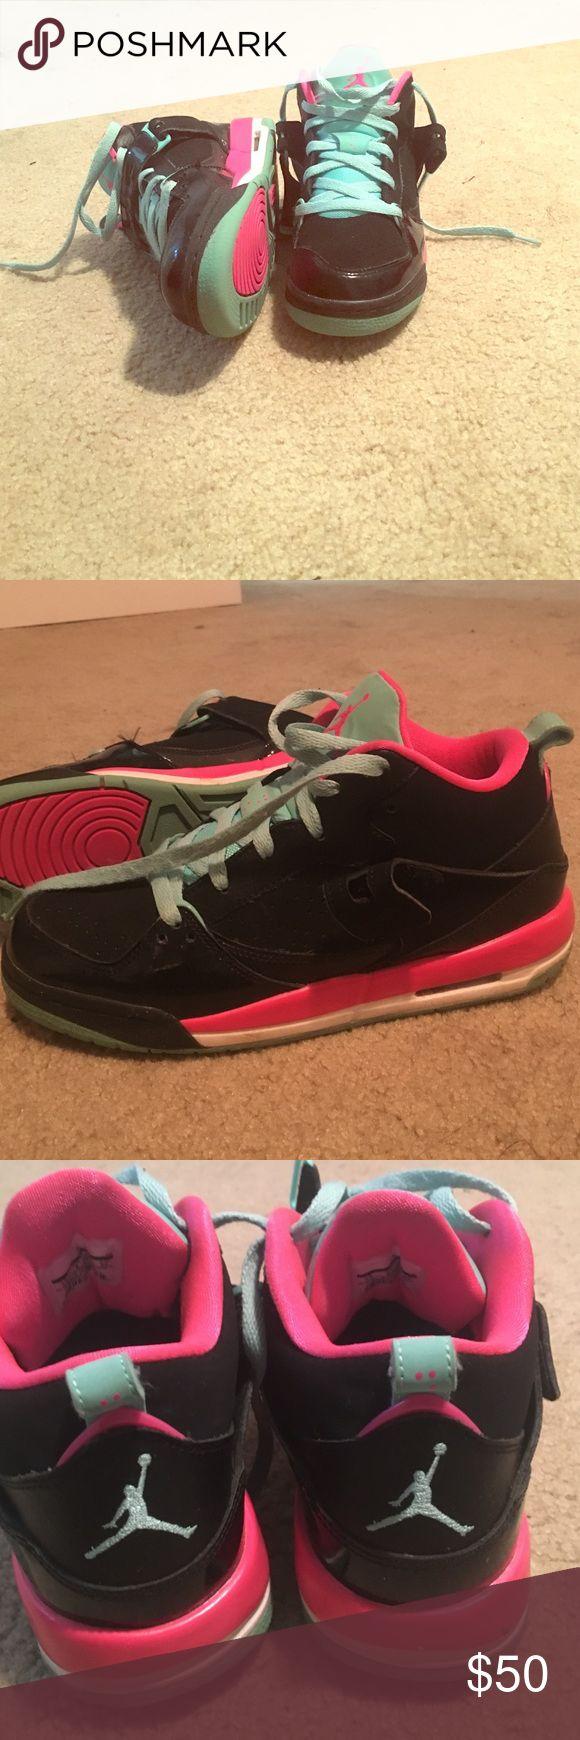 Girls black pink and teal Jordan sneakers Cute girls Jordan sneakers. Girls/boys size 7 which is = to women's size 9 Jordan Shoes Athletic Shoes